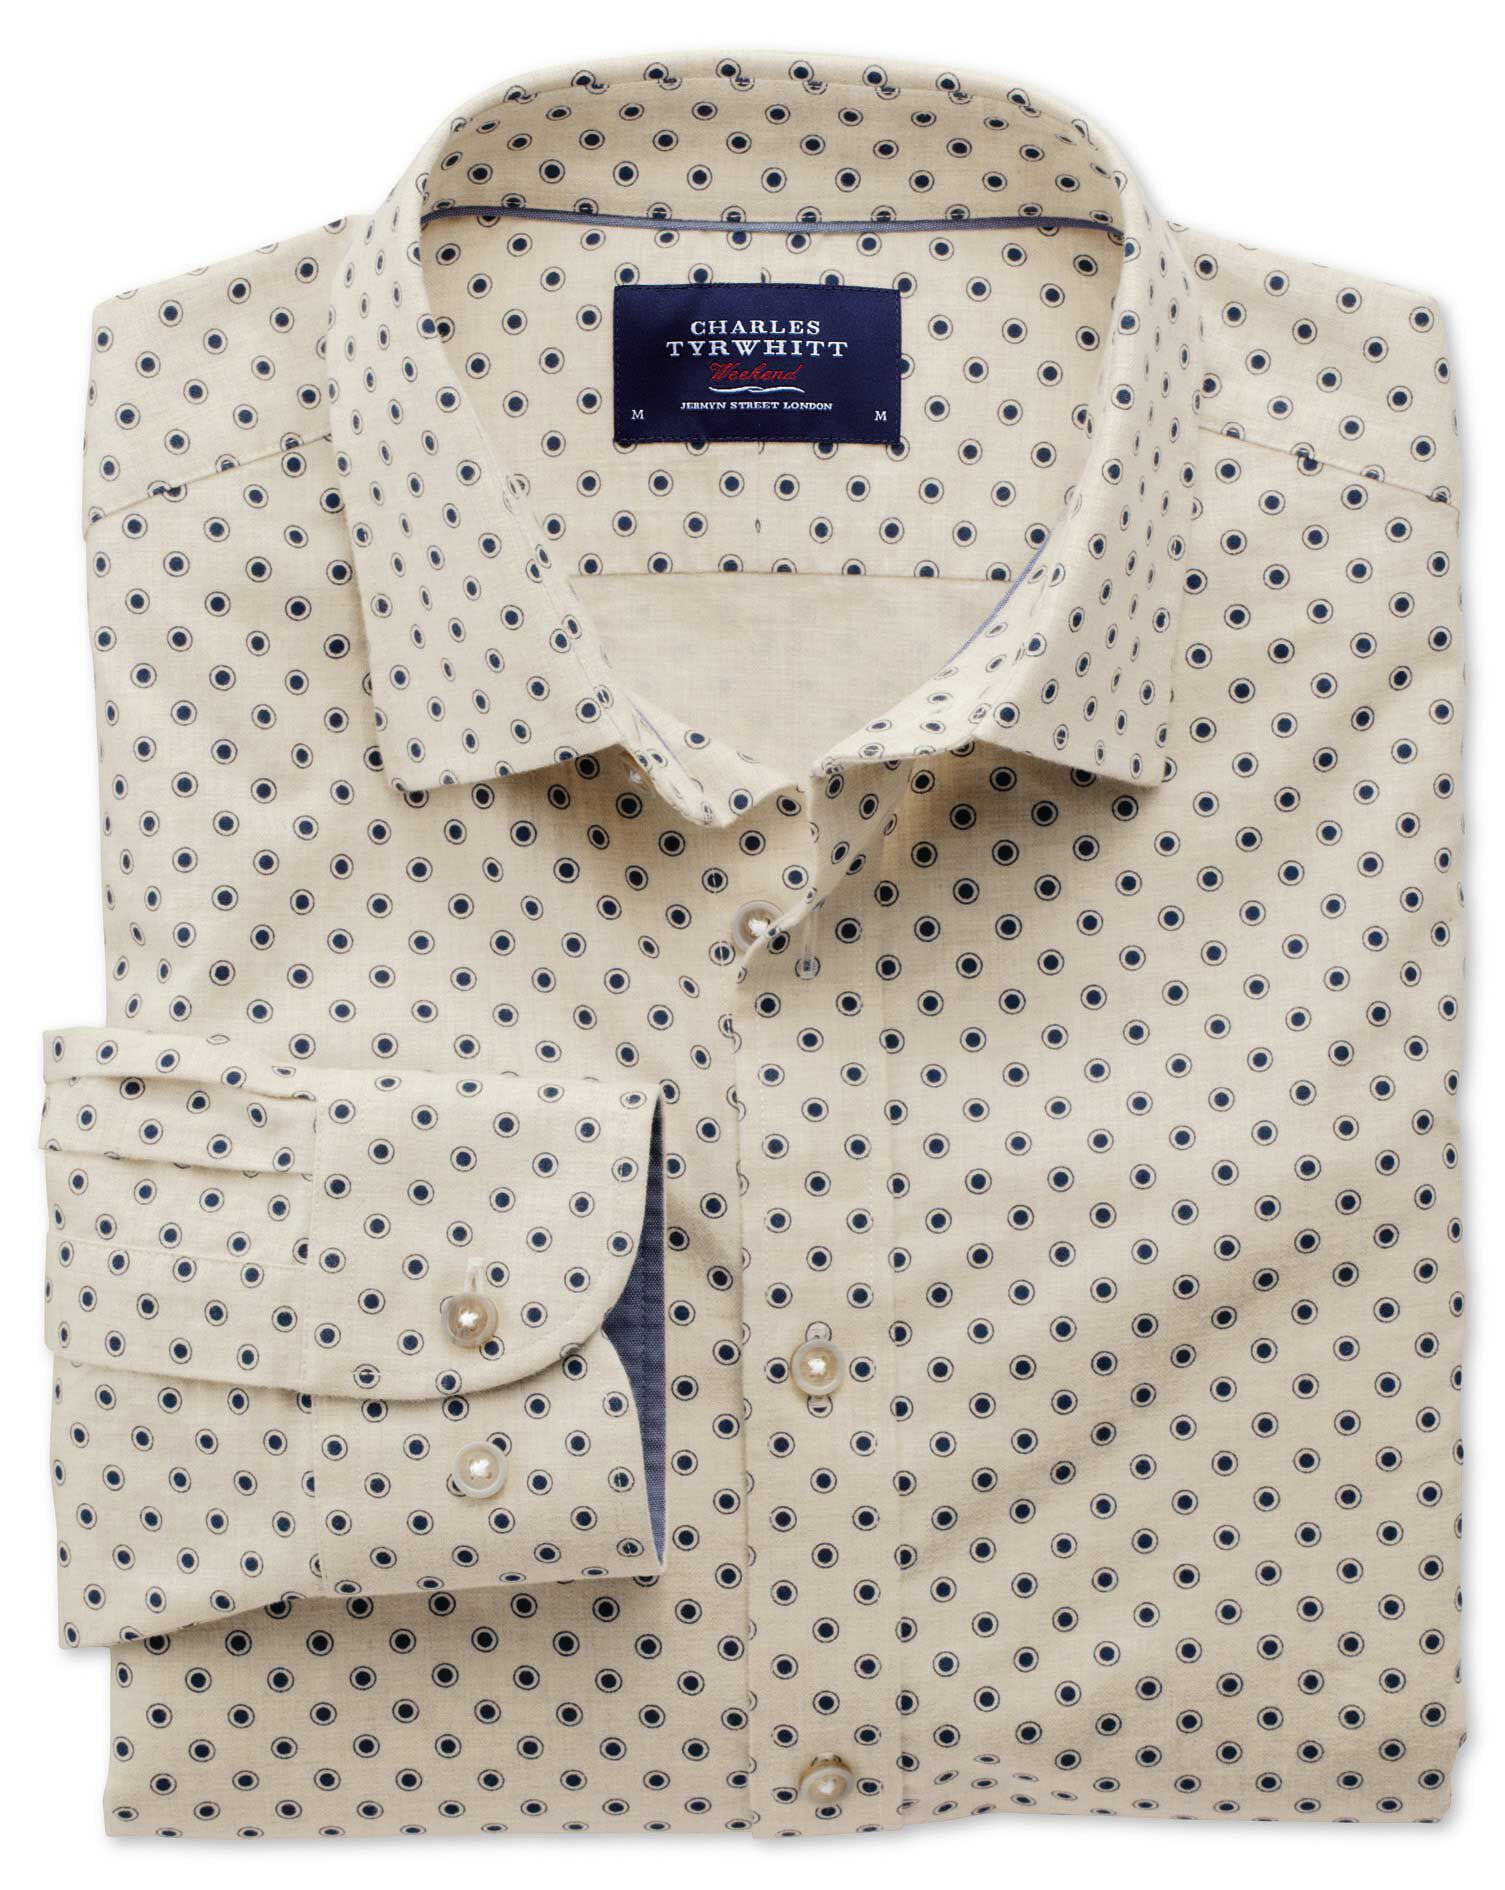 Slim Fit Stone Spot Print Cotton Shirt Single Cuff Size XL by Charles Tyrwhitt